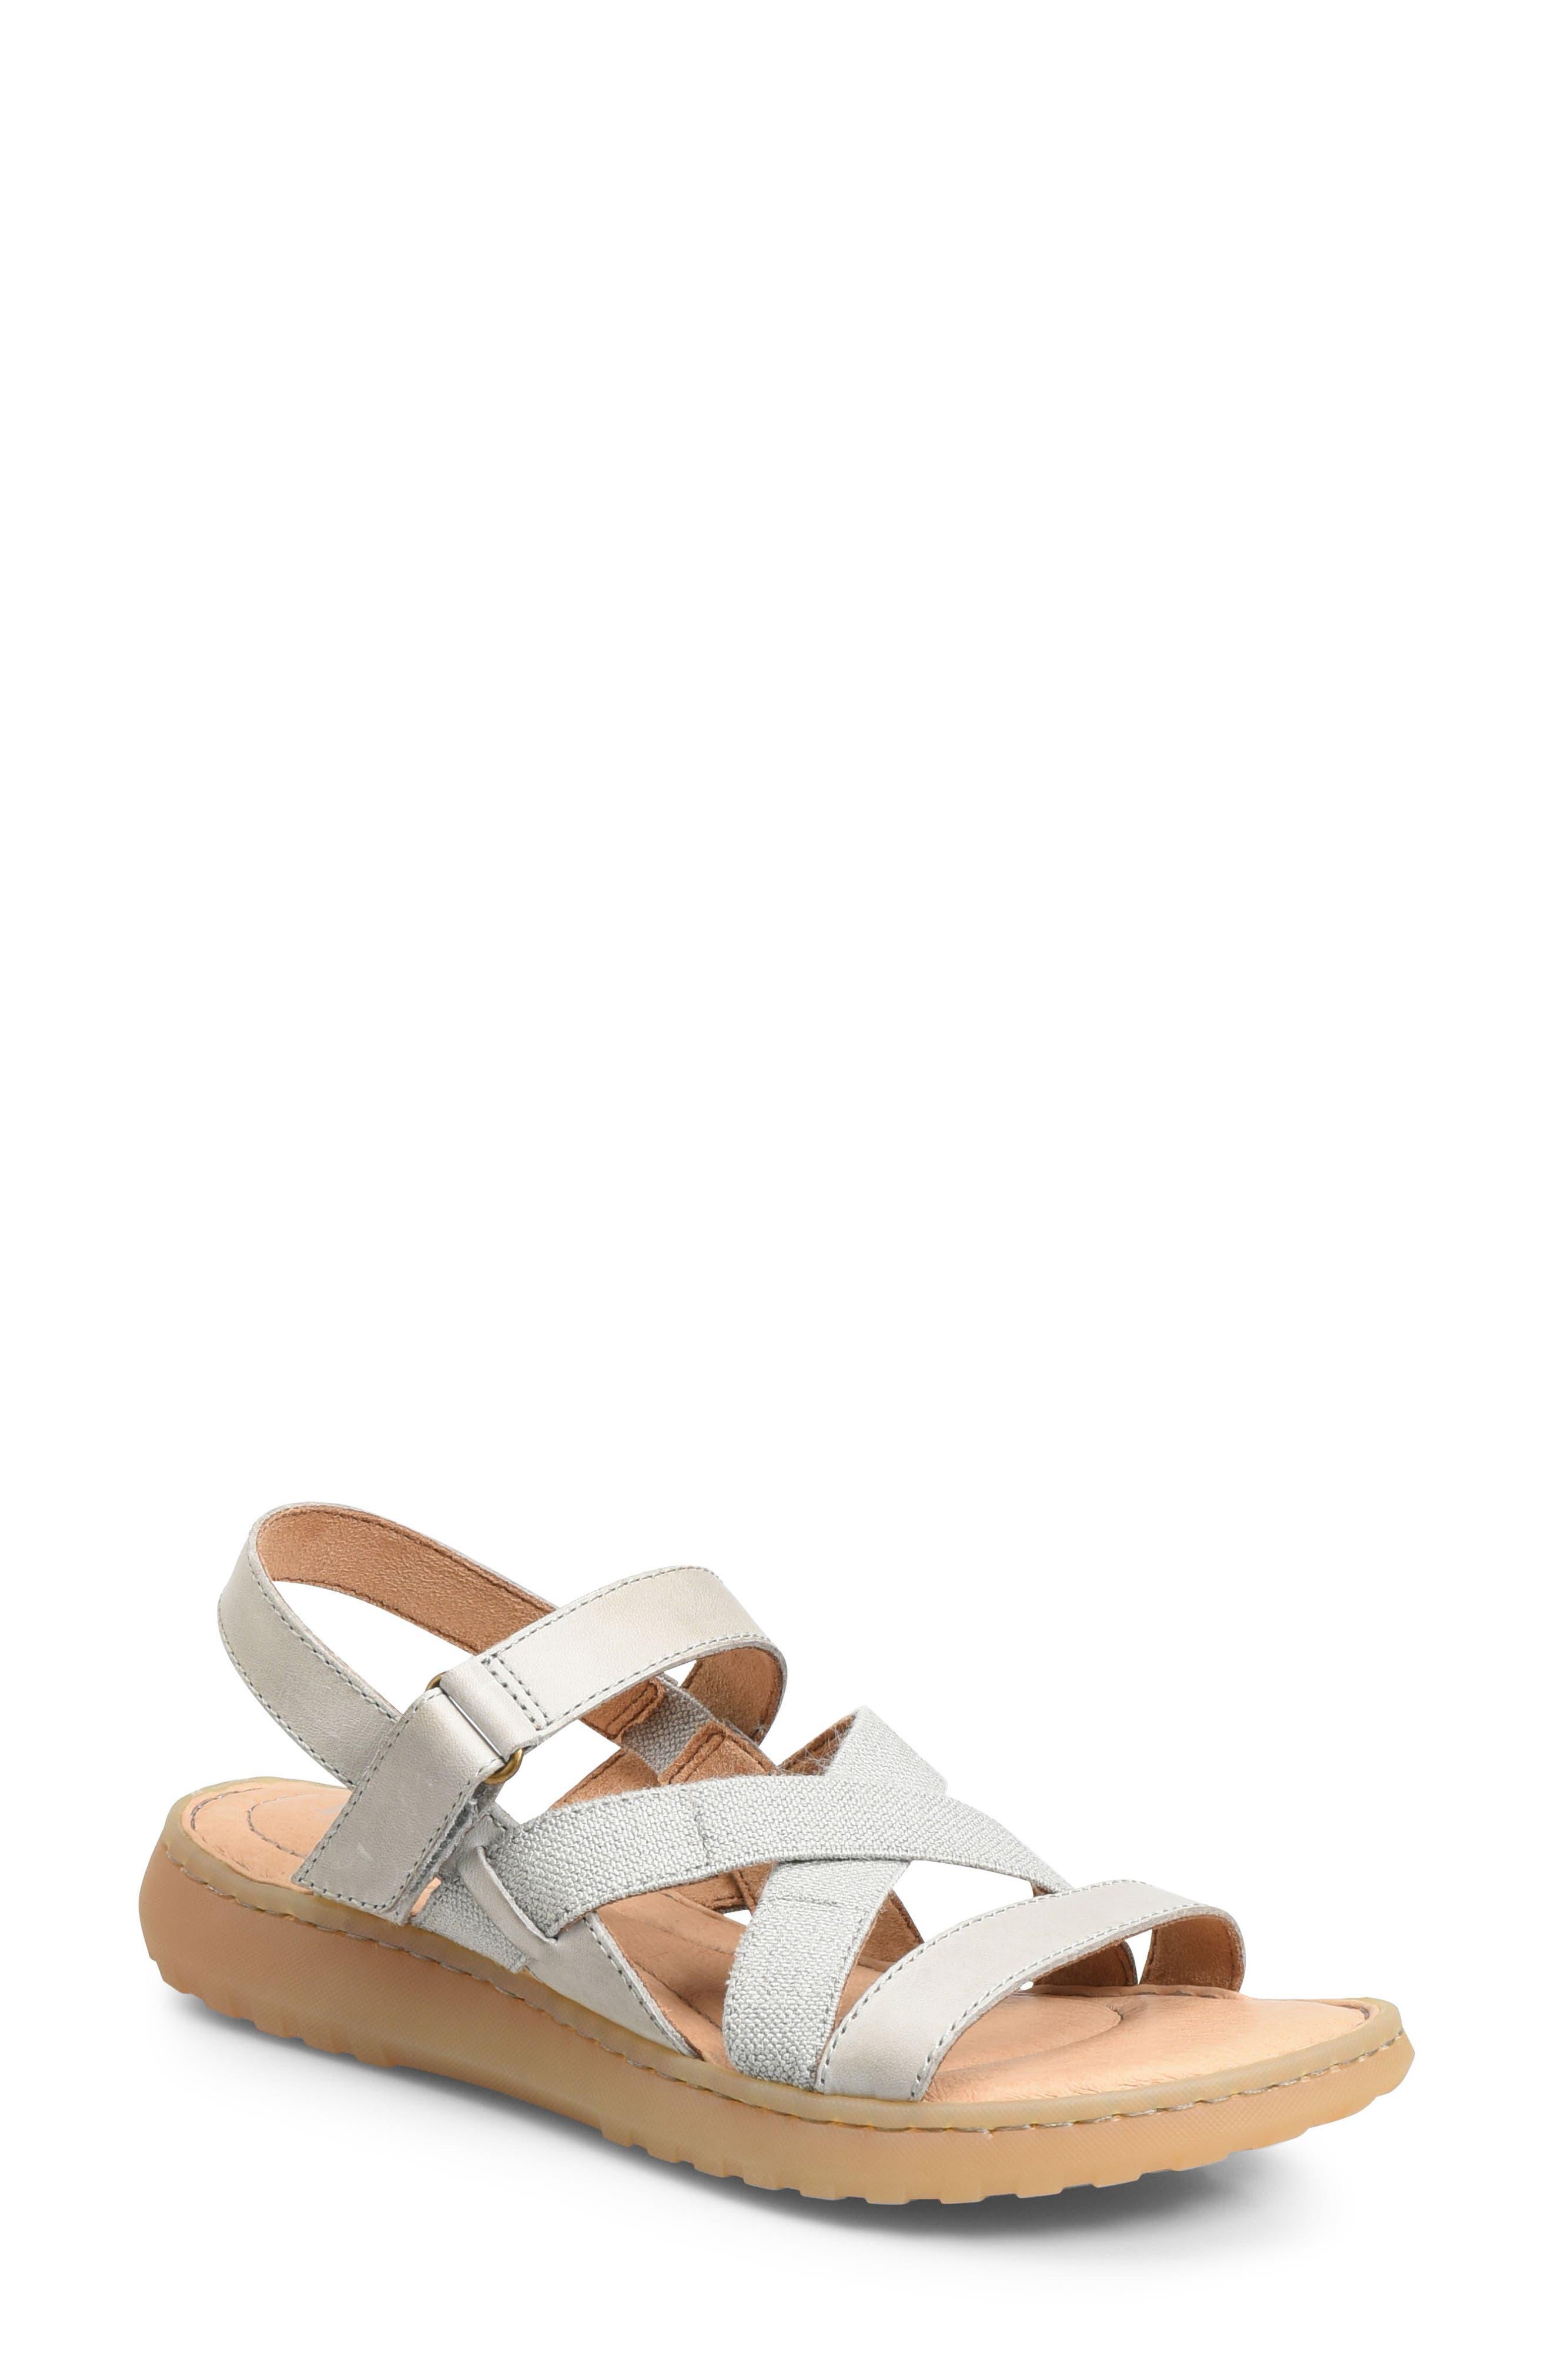 Manta Sandal,                             Main thumbnail 1, color,                             Light Grey Leather